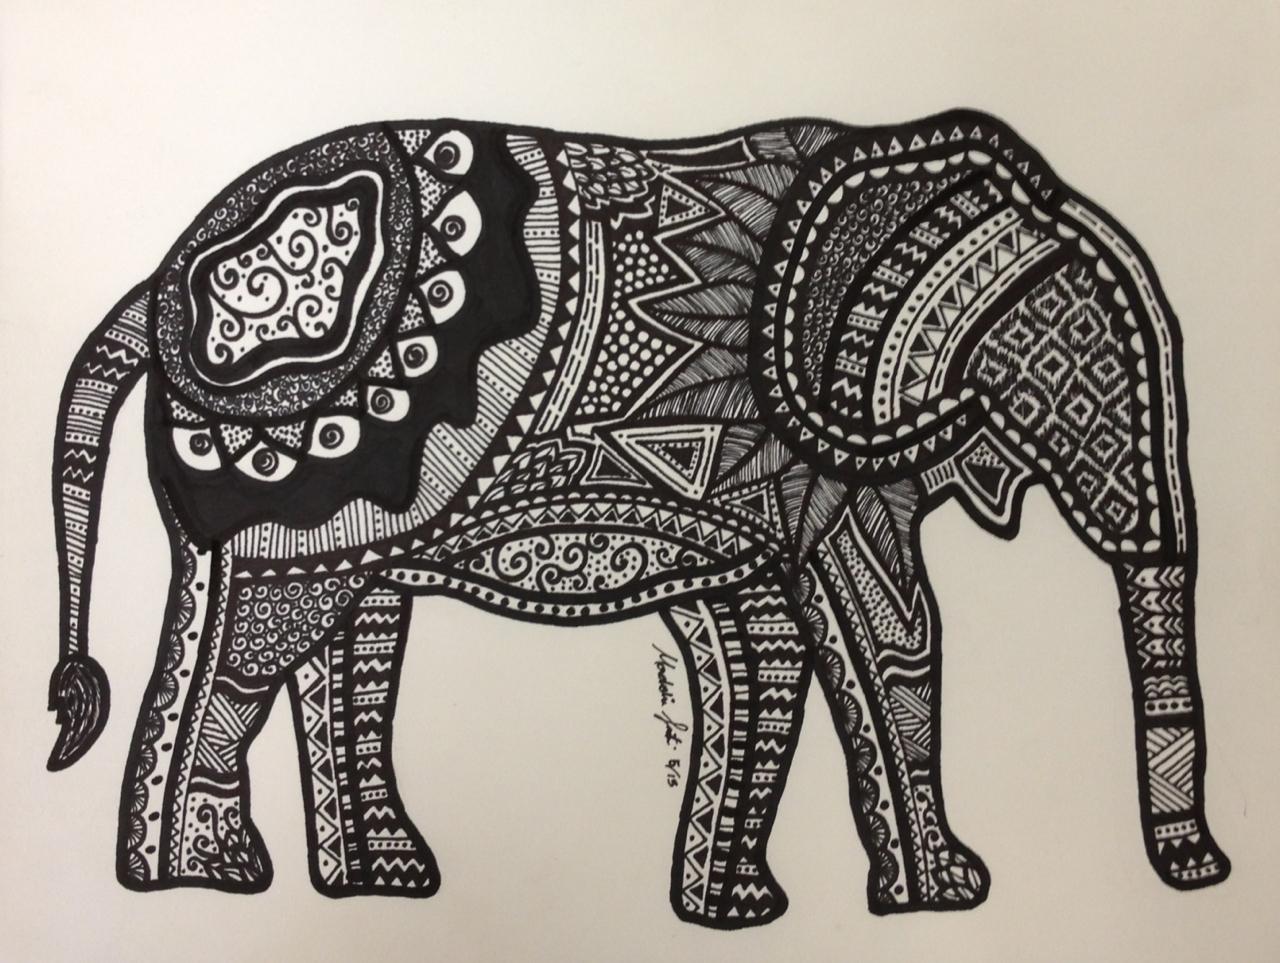 1280x963 Animal Drawings Tumblr Hindu Elephant Drawing Tumblr